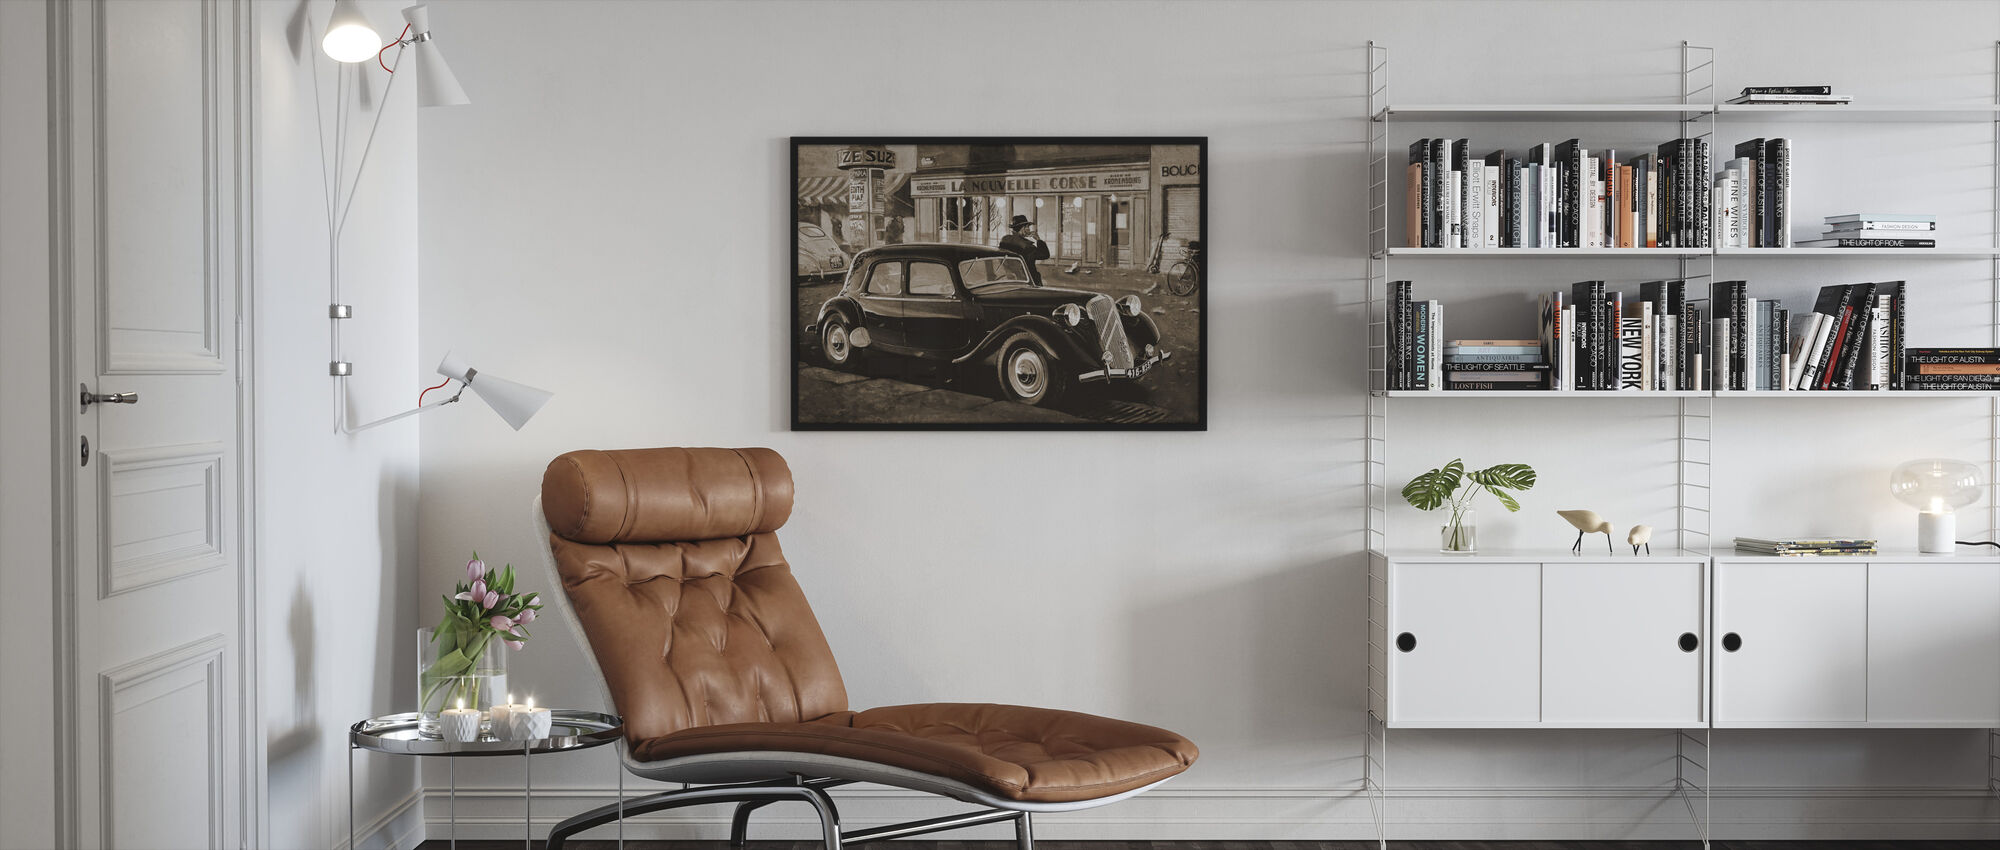 B15 in Paris Sepia - Framed print - Living Room